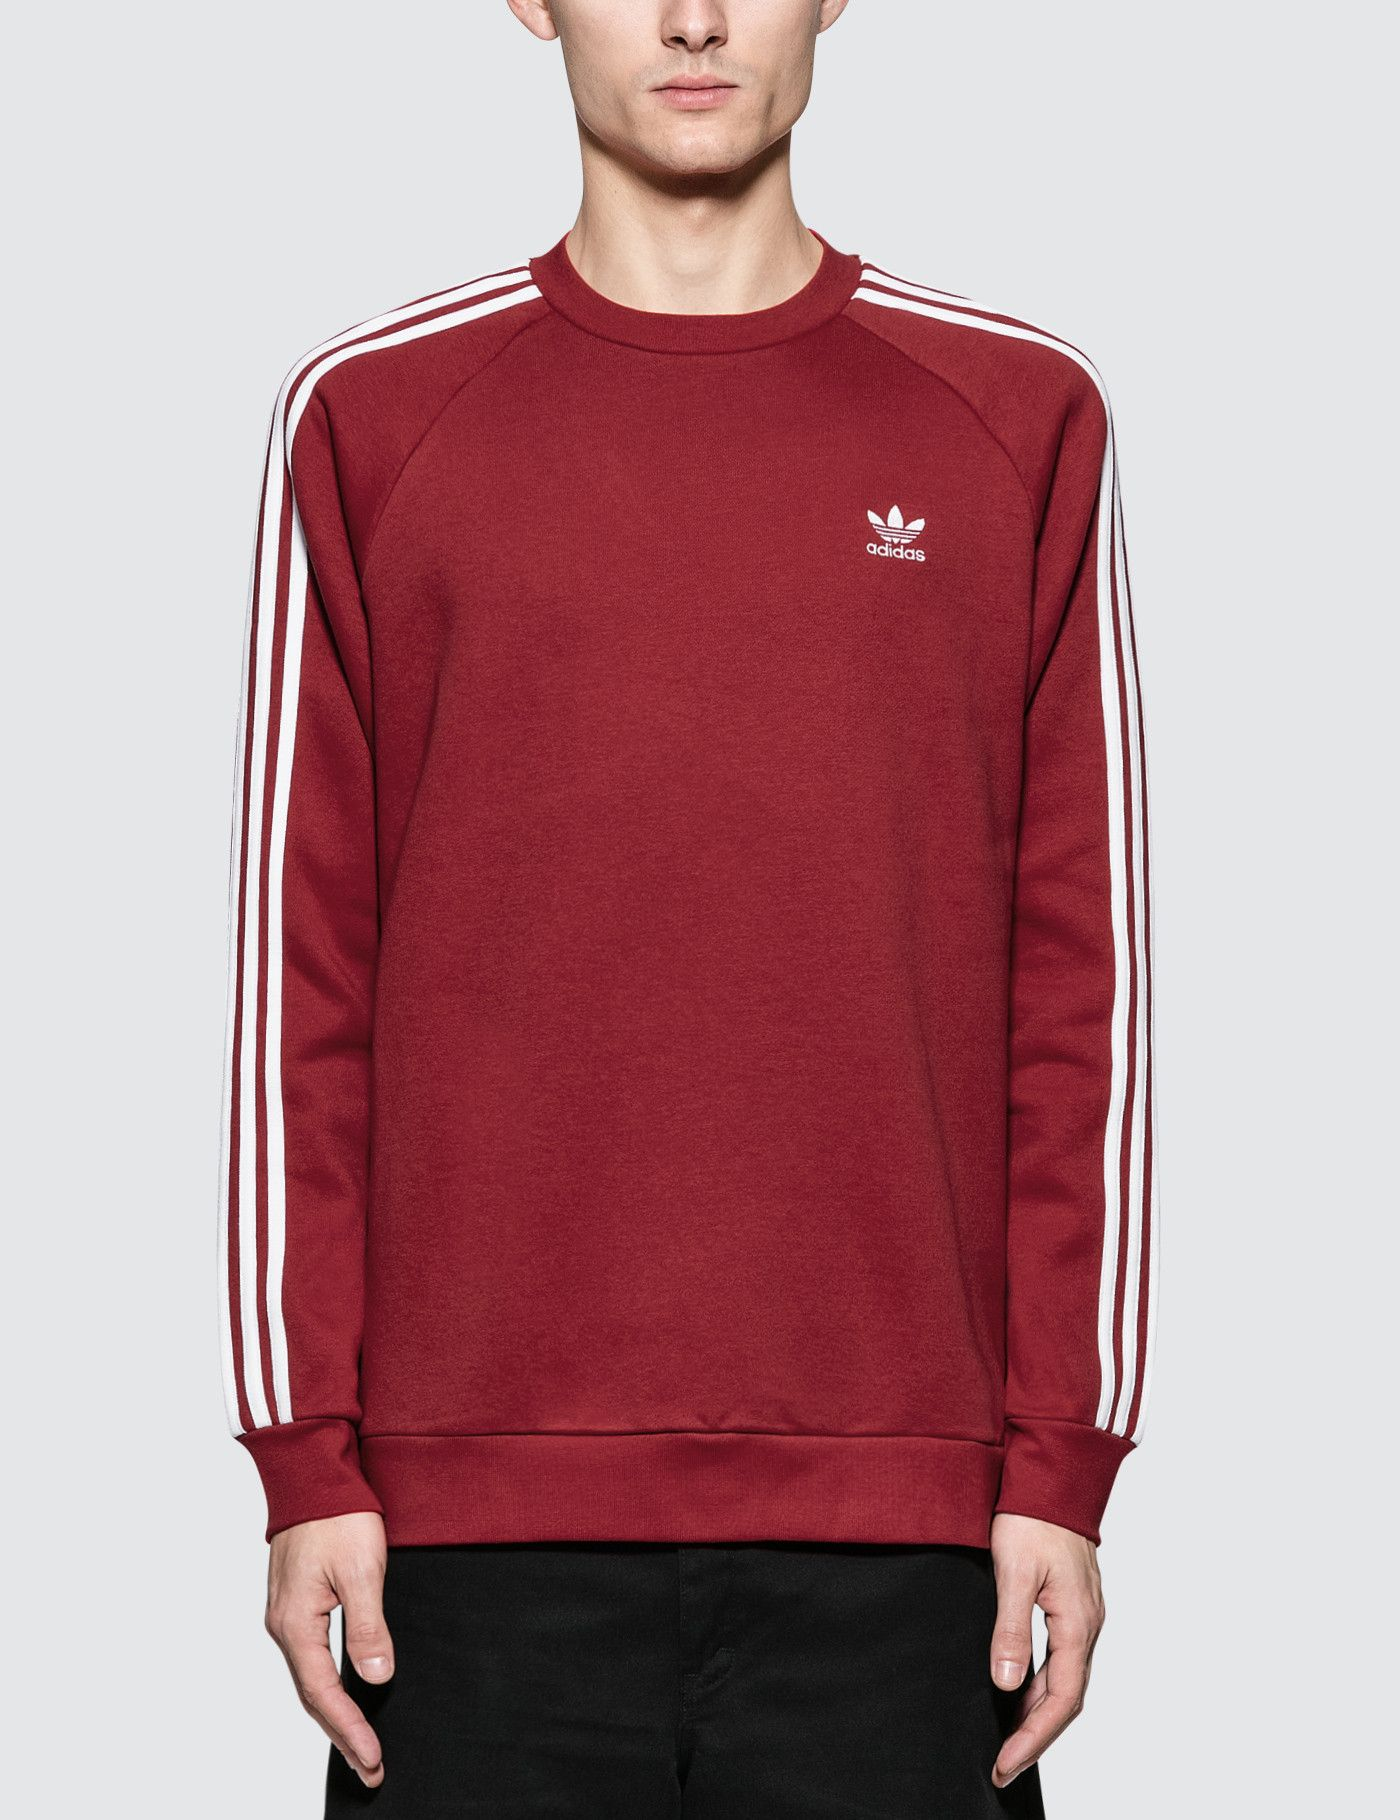 Home Best Deals Discounts And Coupons Online Fashion Crew Neck Sweatshirt Long Sleeve Tshirt Men [ 1820 x 1400 Pixel ]